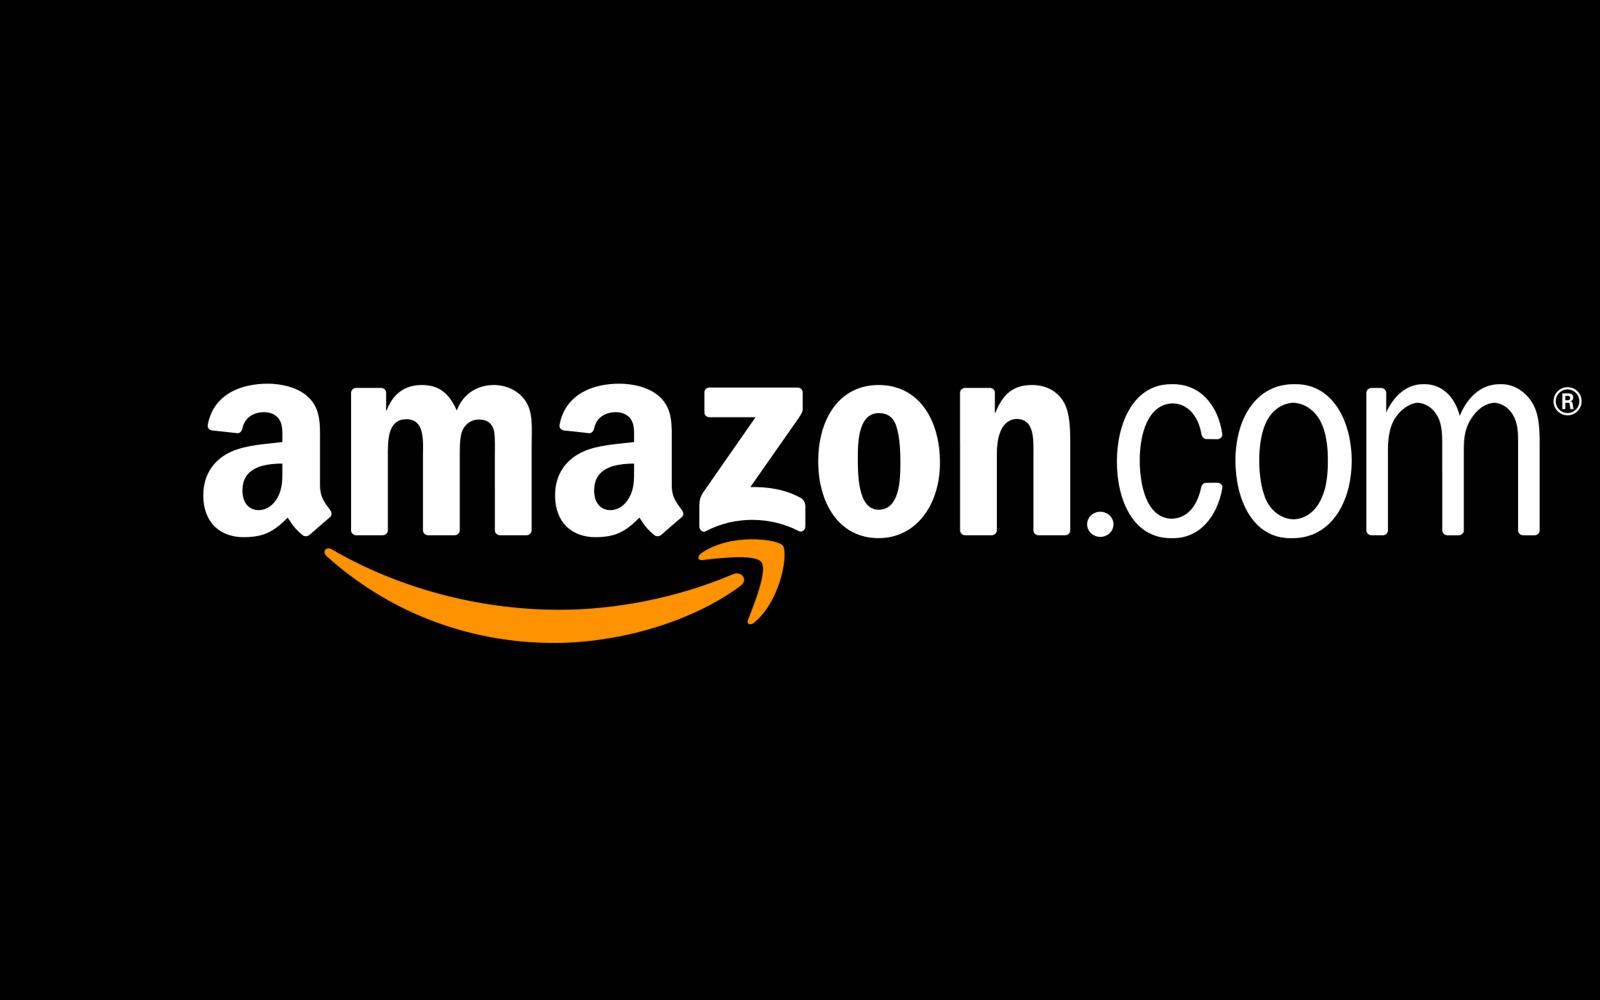 Amazon_logo-4.jpg